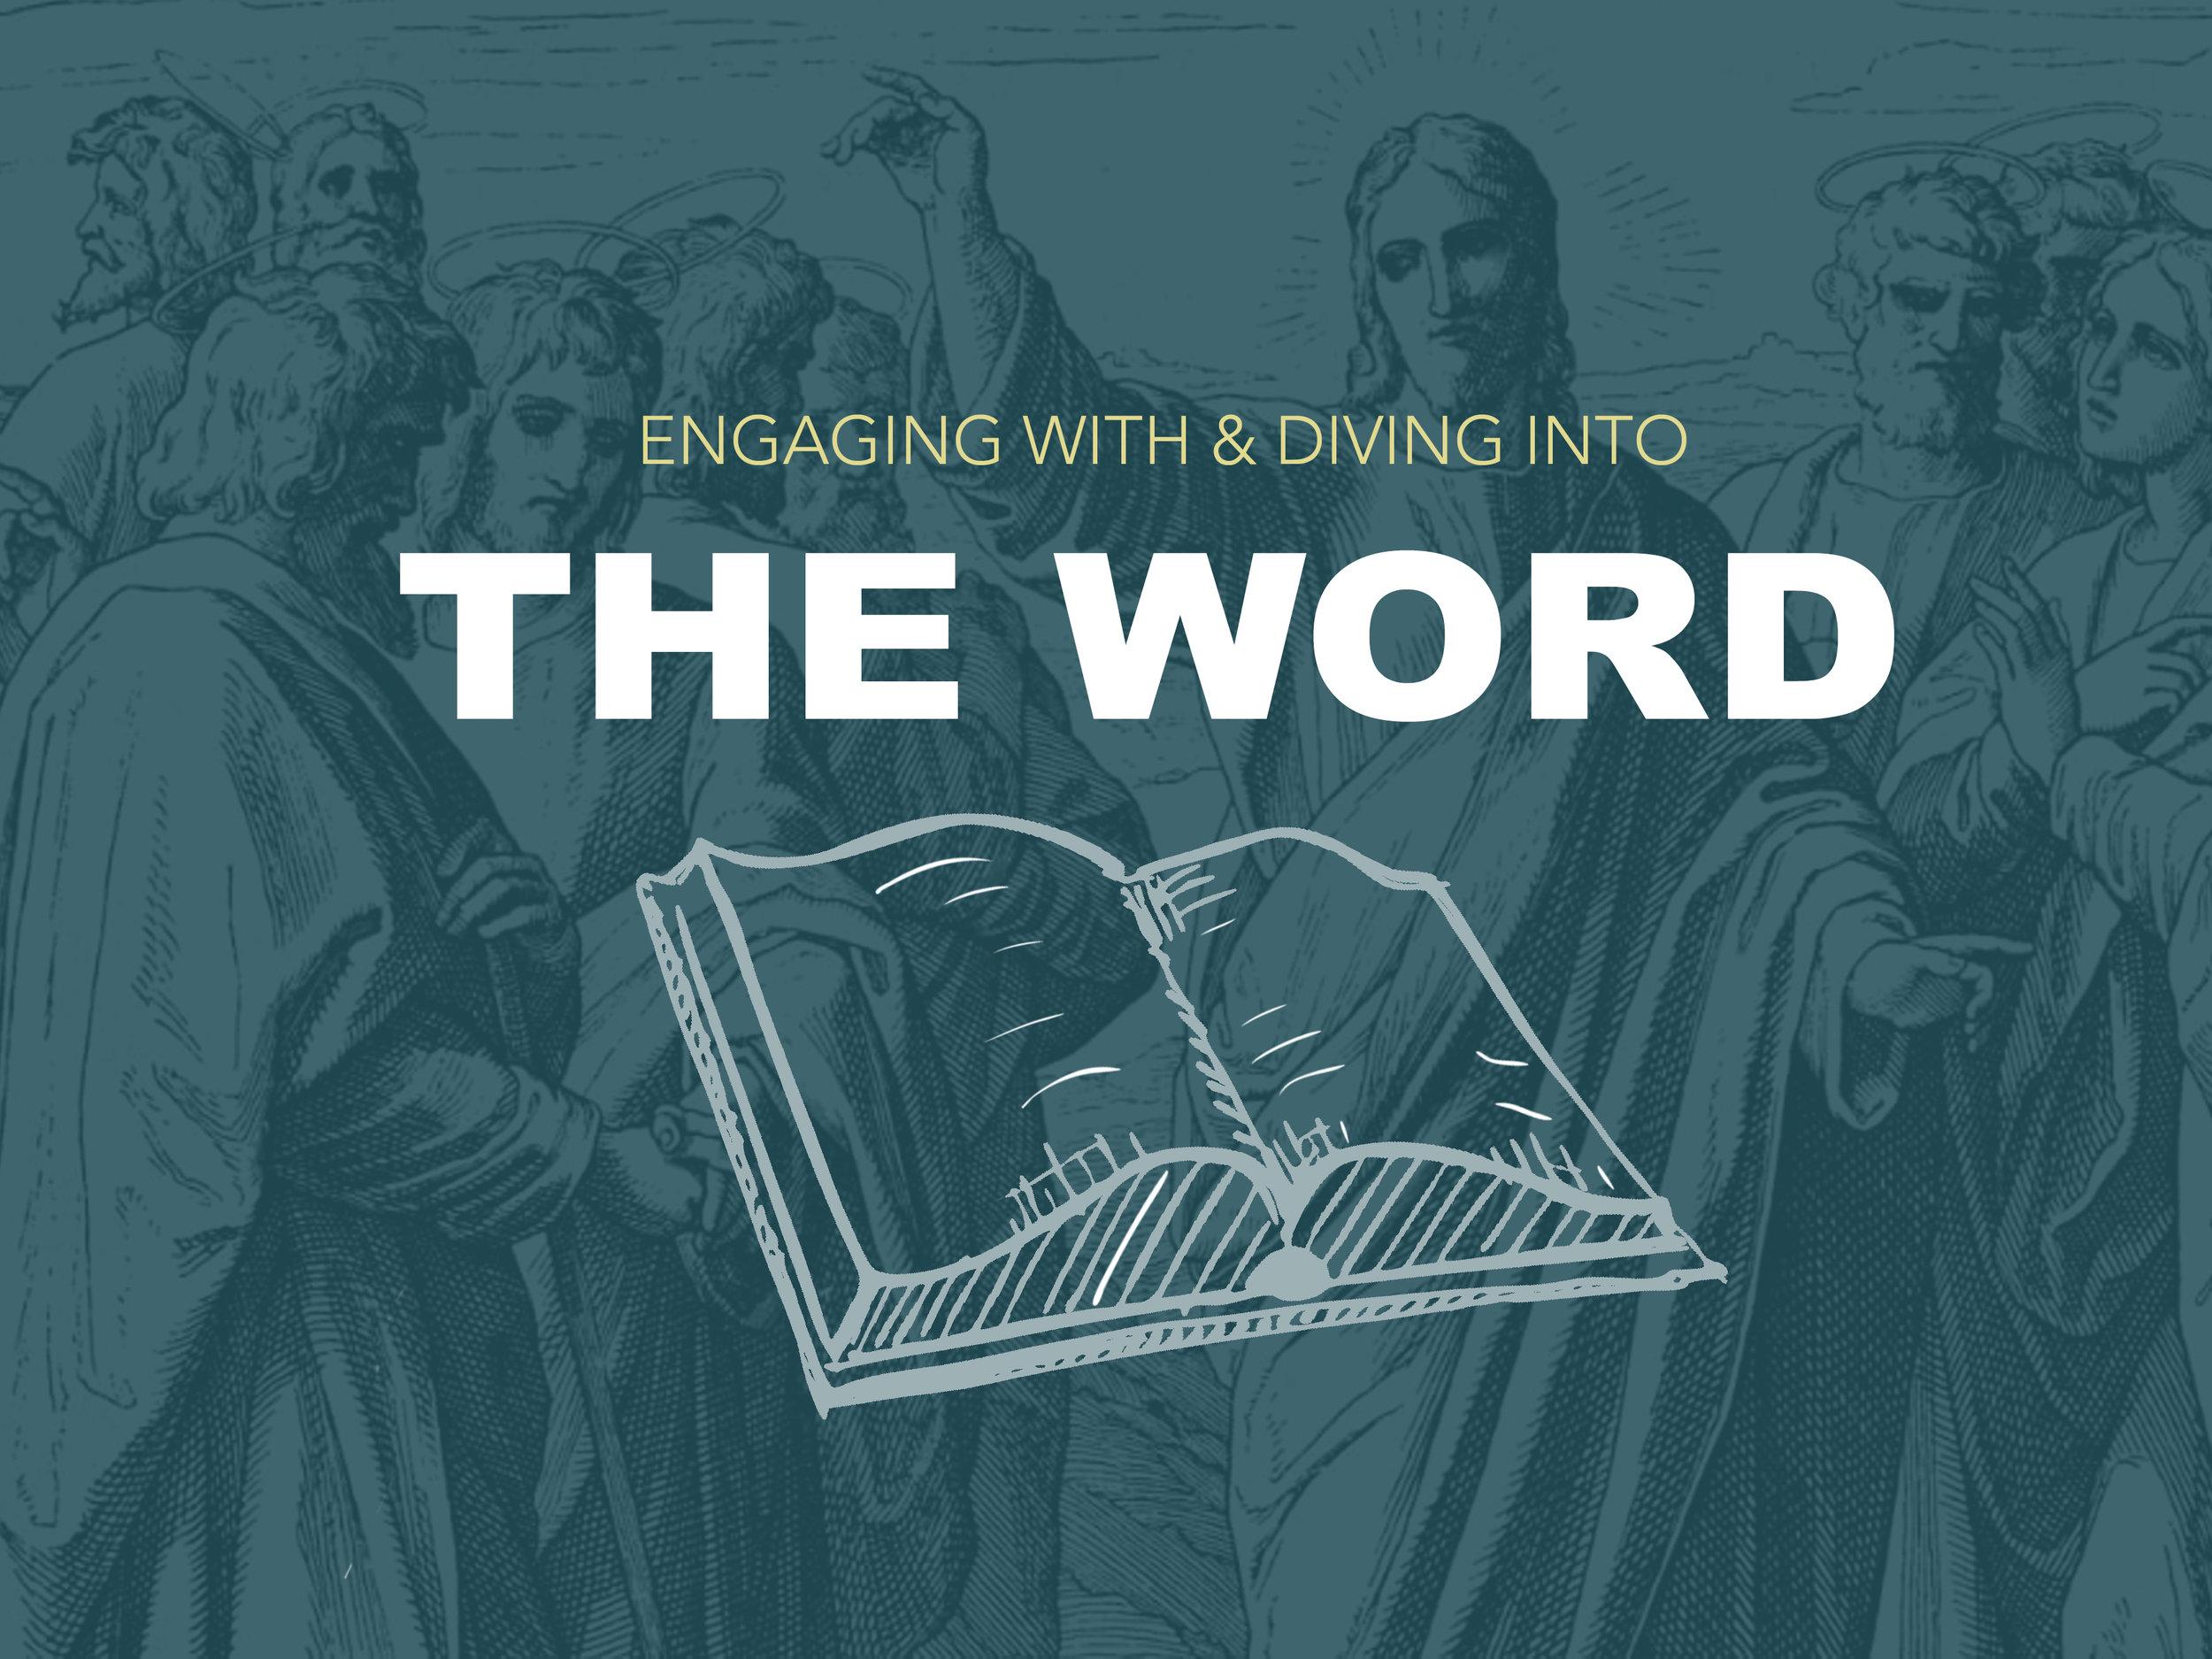 The Word.jpg